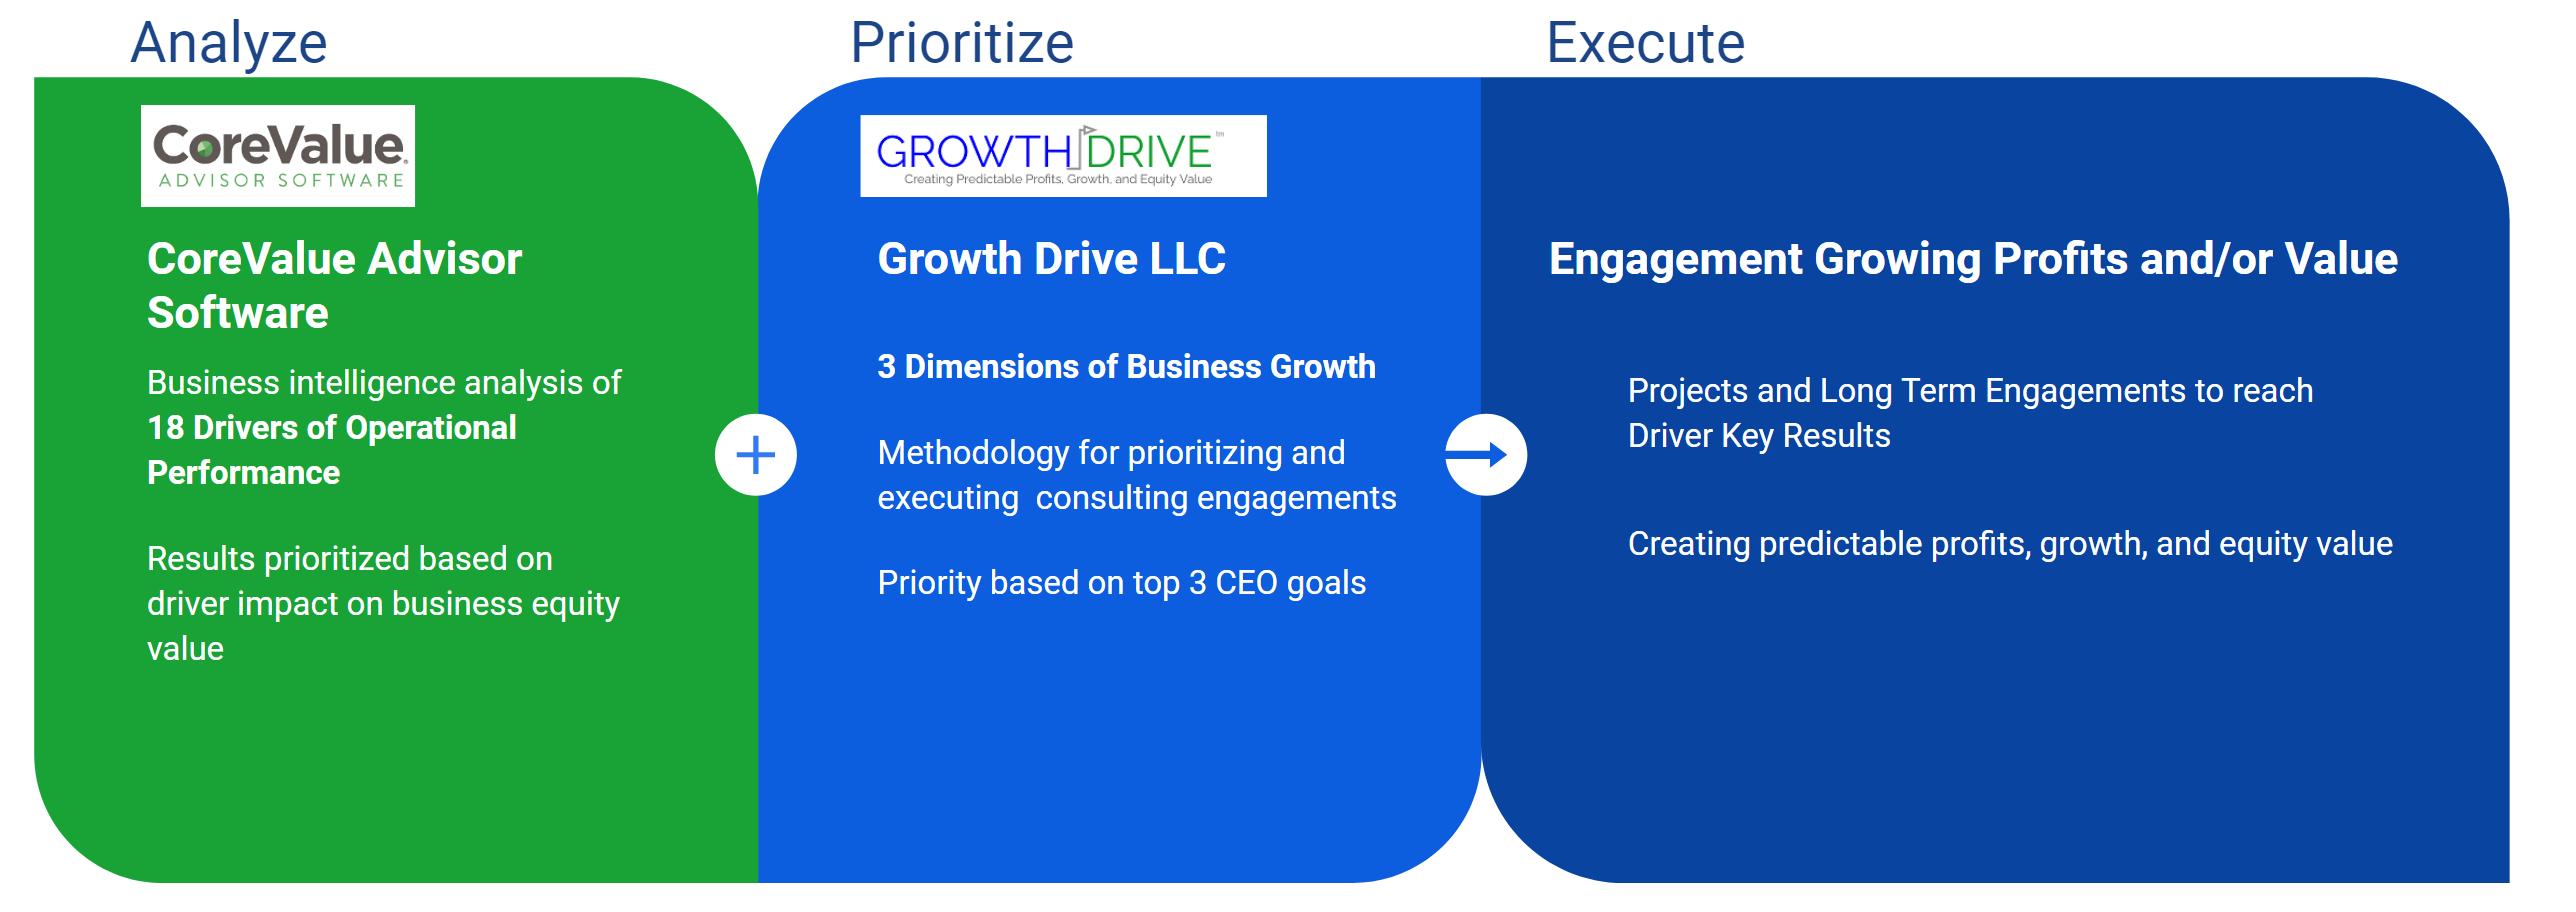 Analyze Prioritize Execute